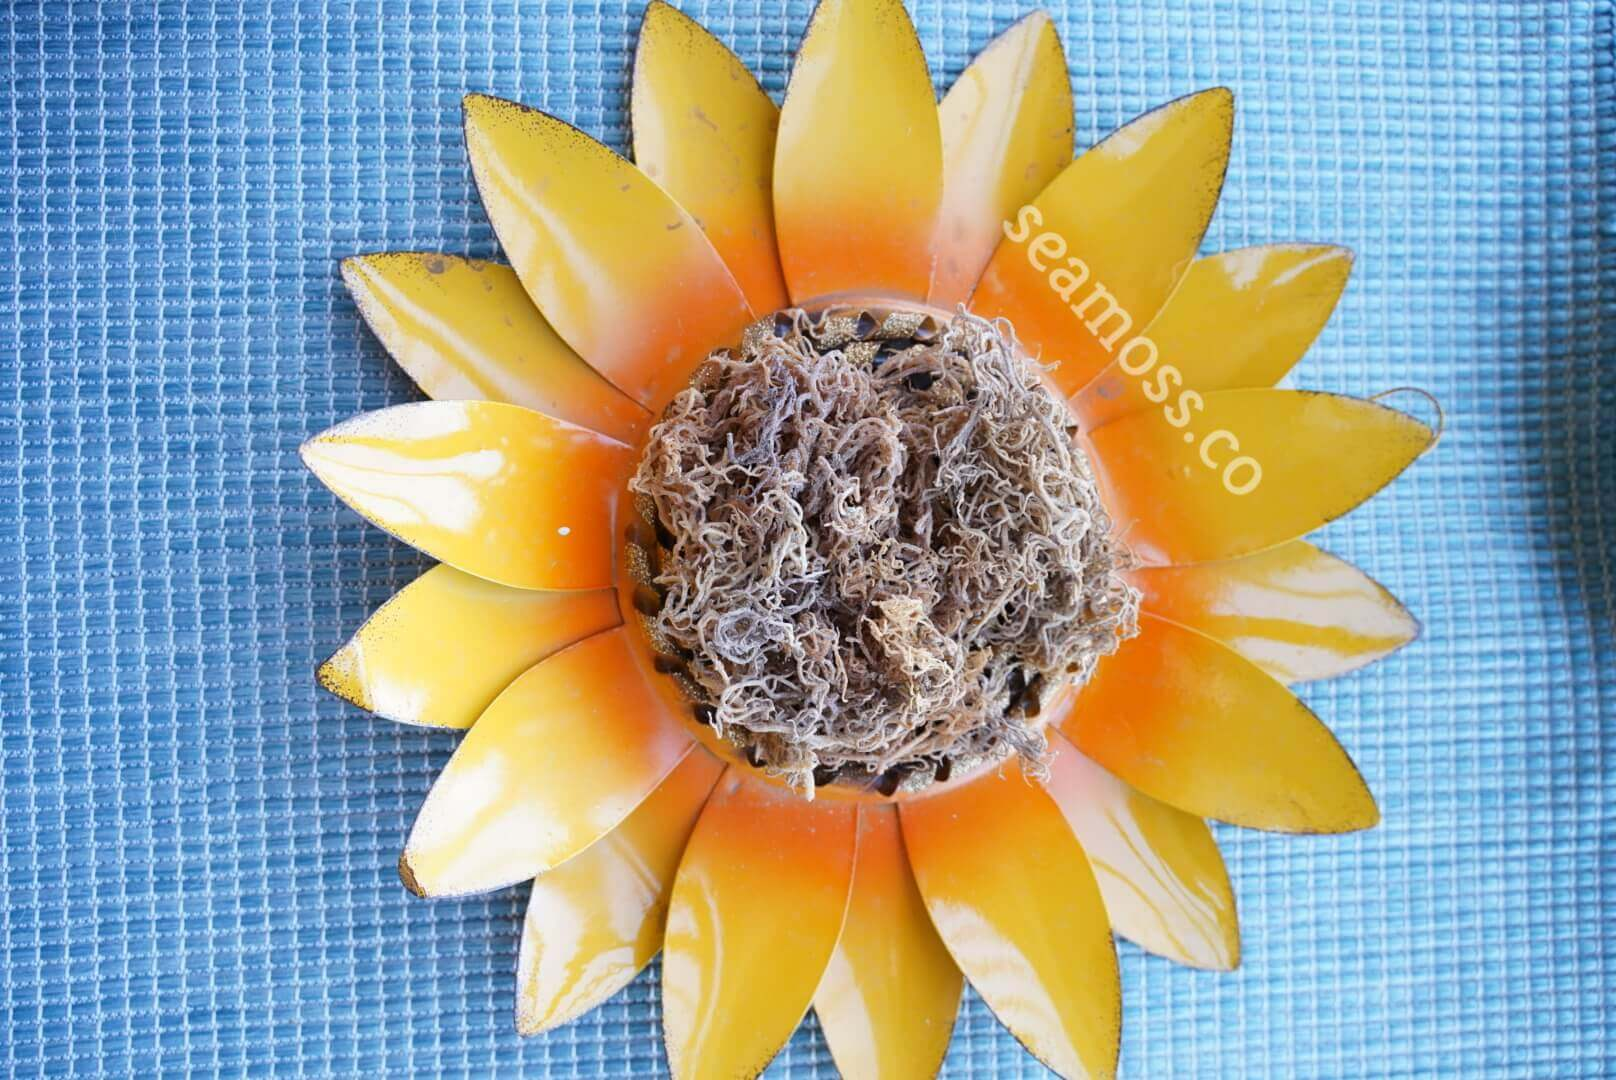 Wildcrafted Sea Moss on Sunflower